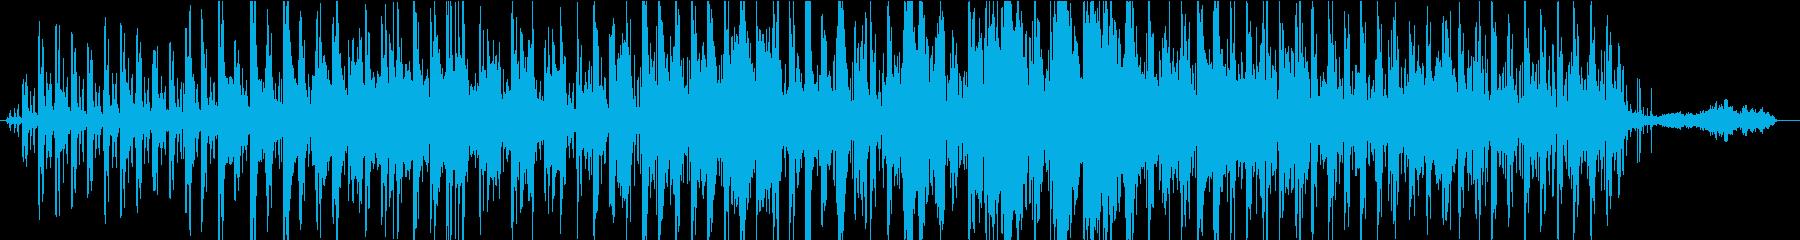 SWEET THINGの再生済みの波形